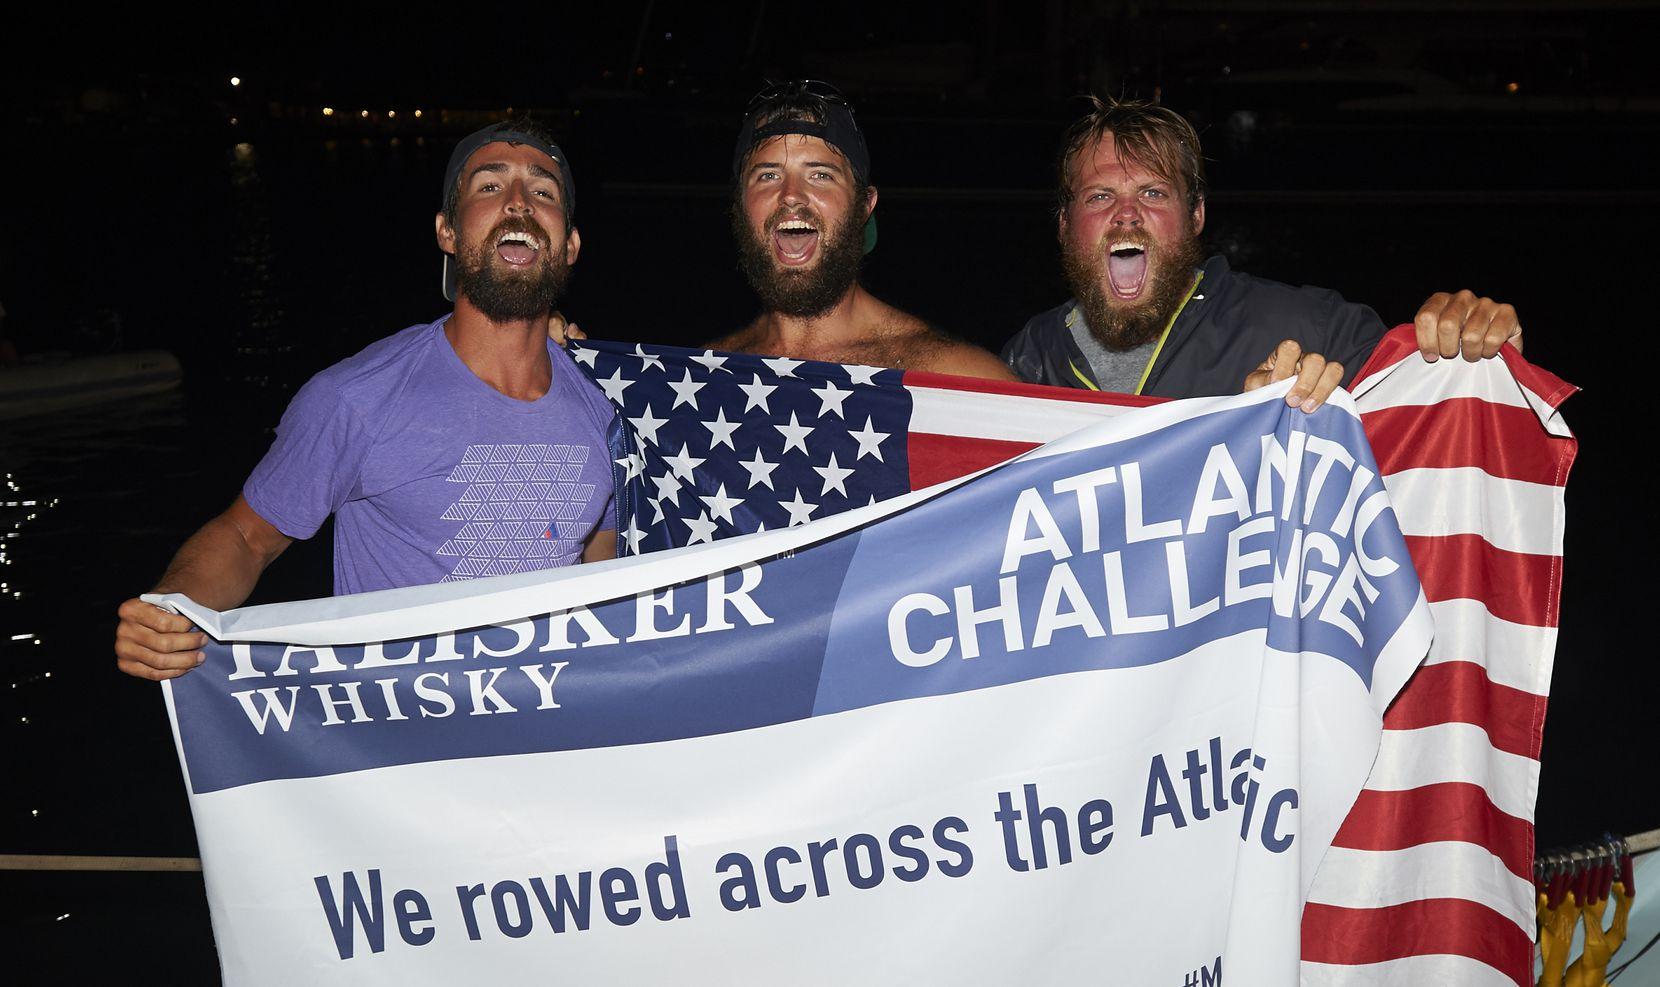 The team celebrates back on shore. (Ben Duffy)